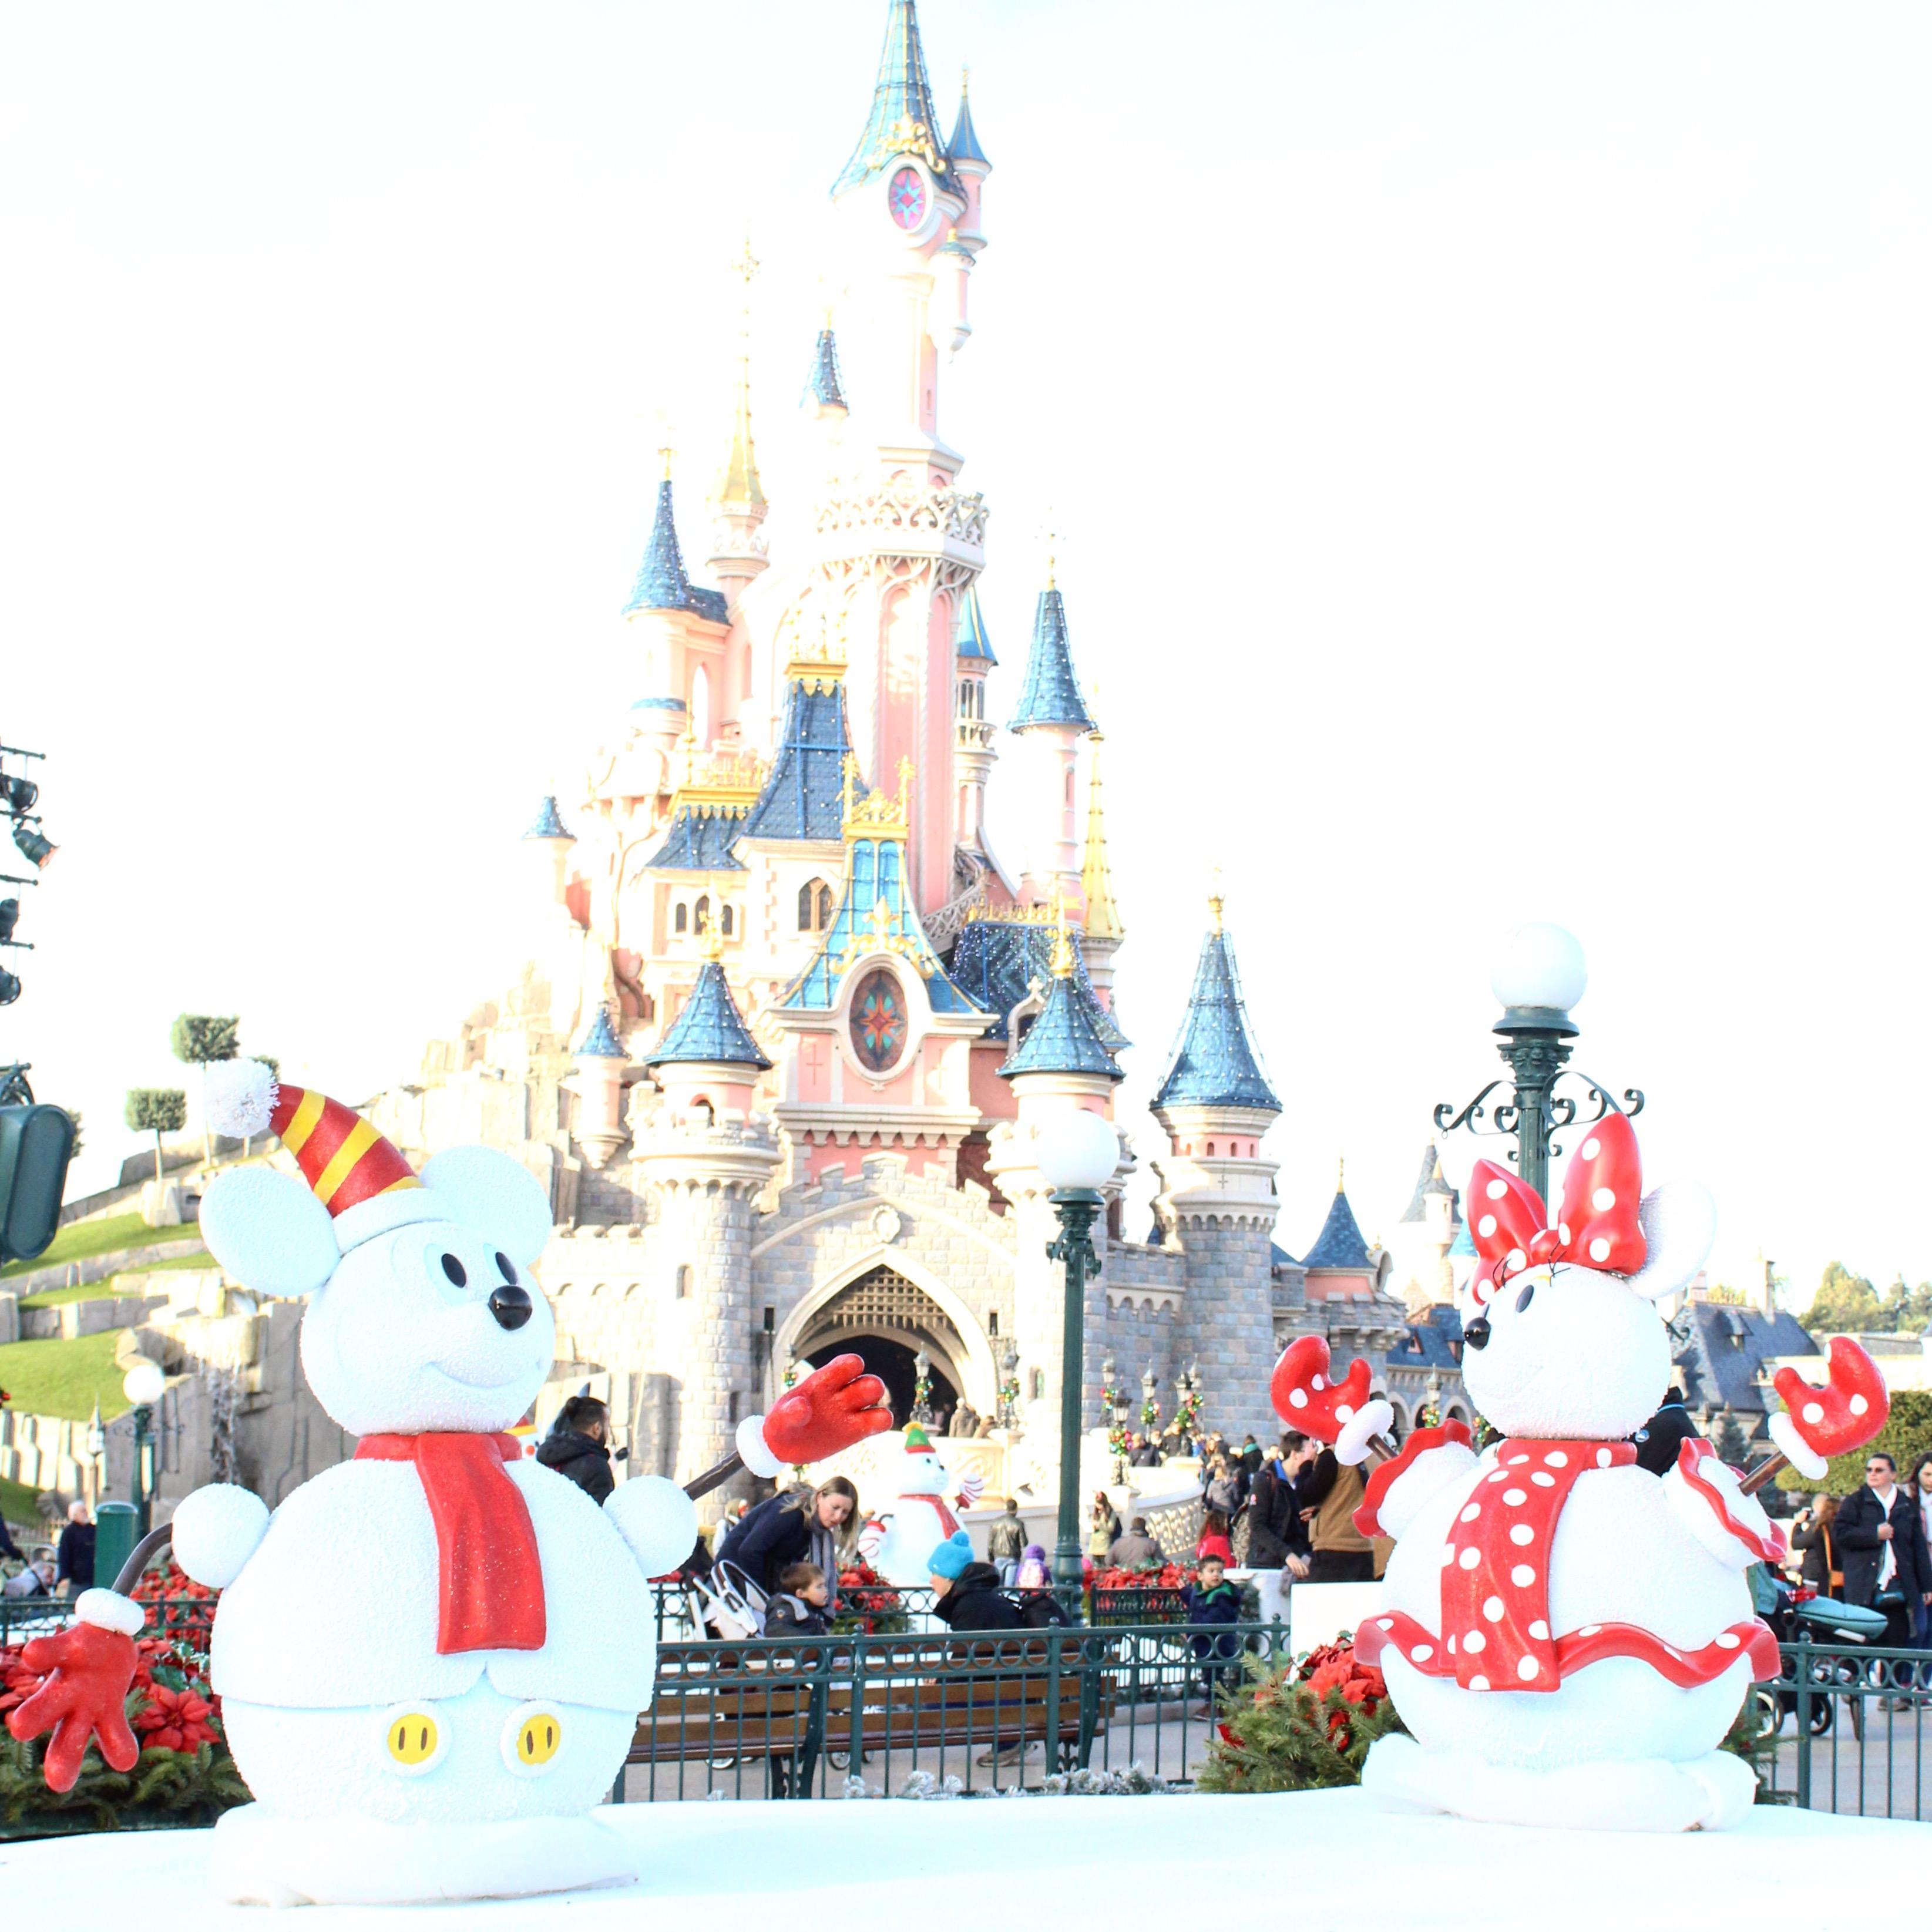 Disneyland Decorated For Christmas: Christmas Decorations Disneyland Paris